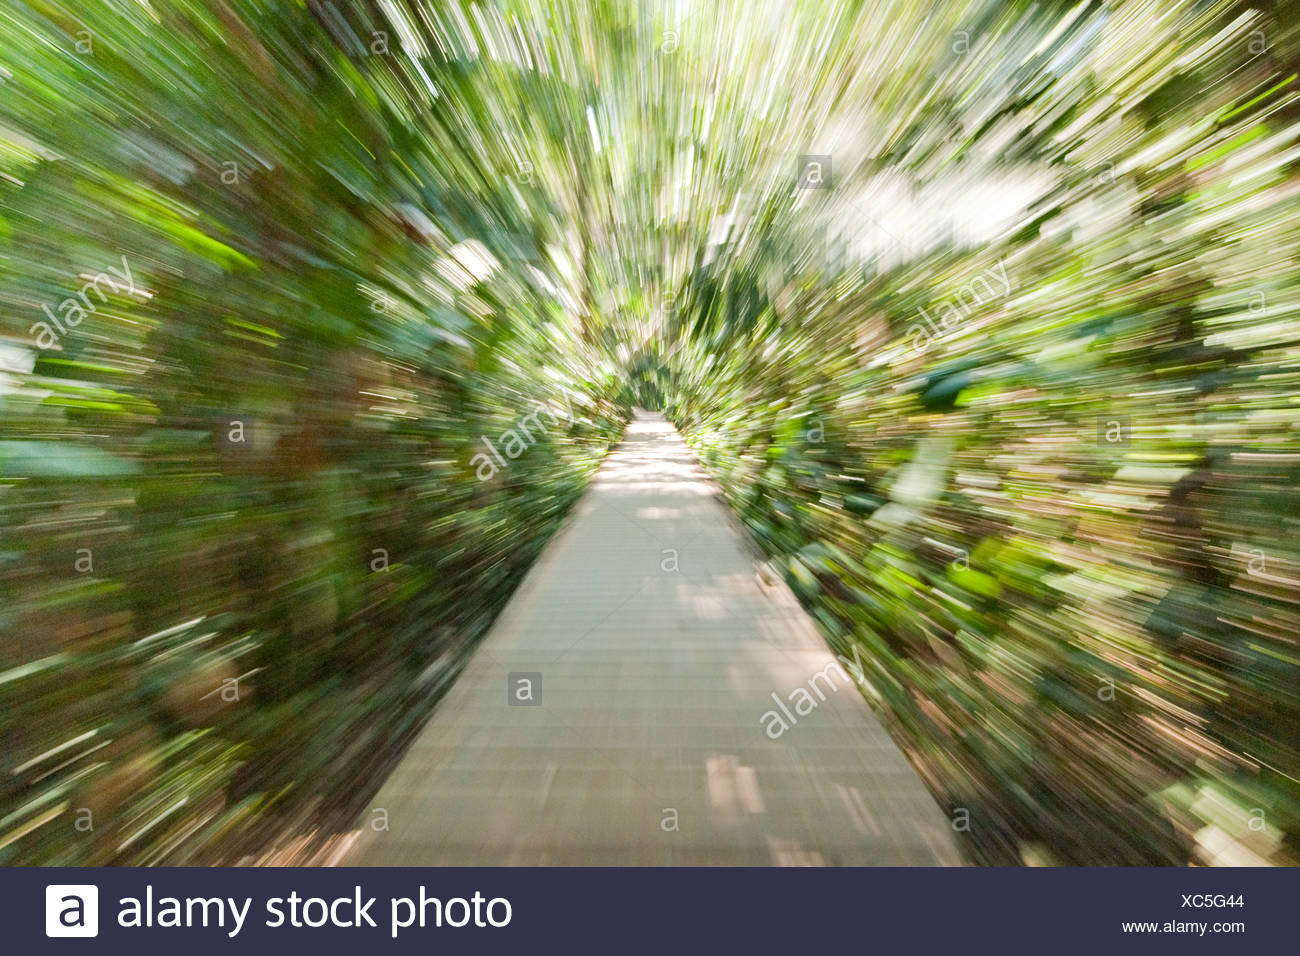 A wooden path through the rainforest in warped speed. Stock Photo